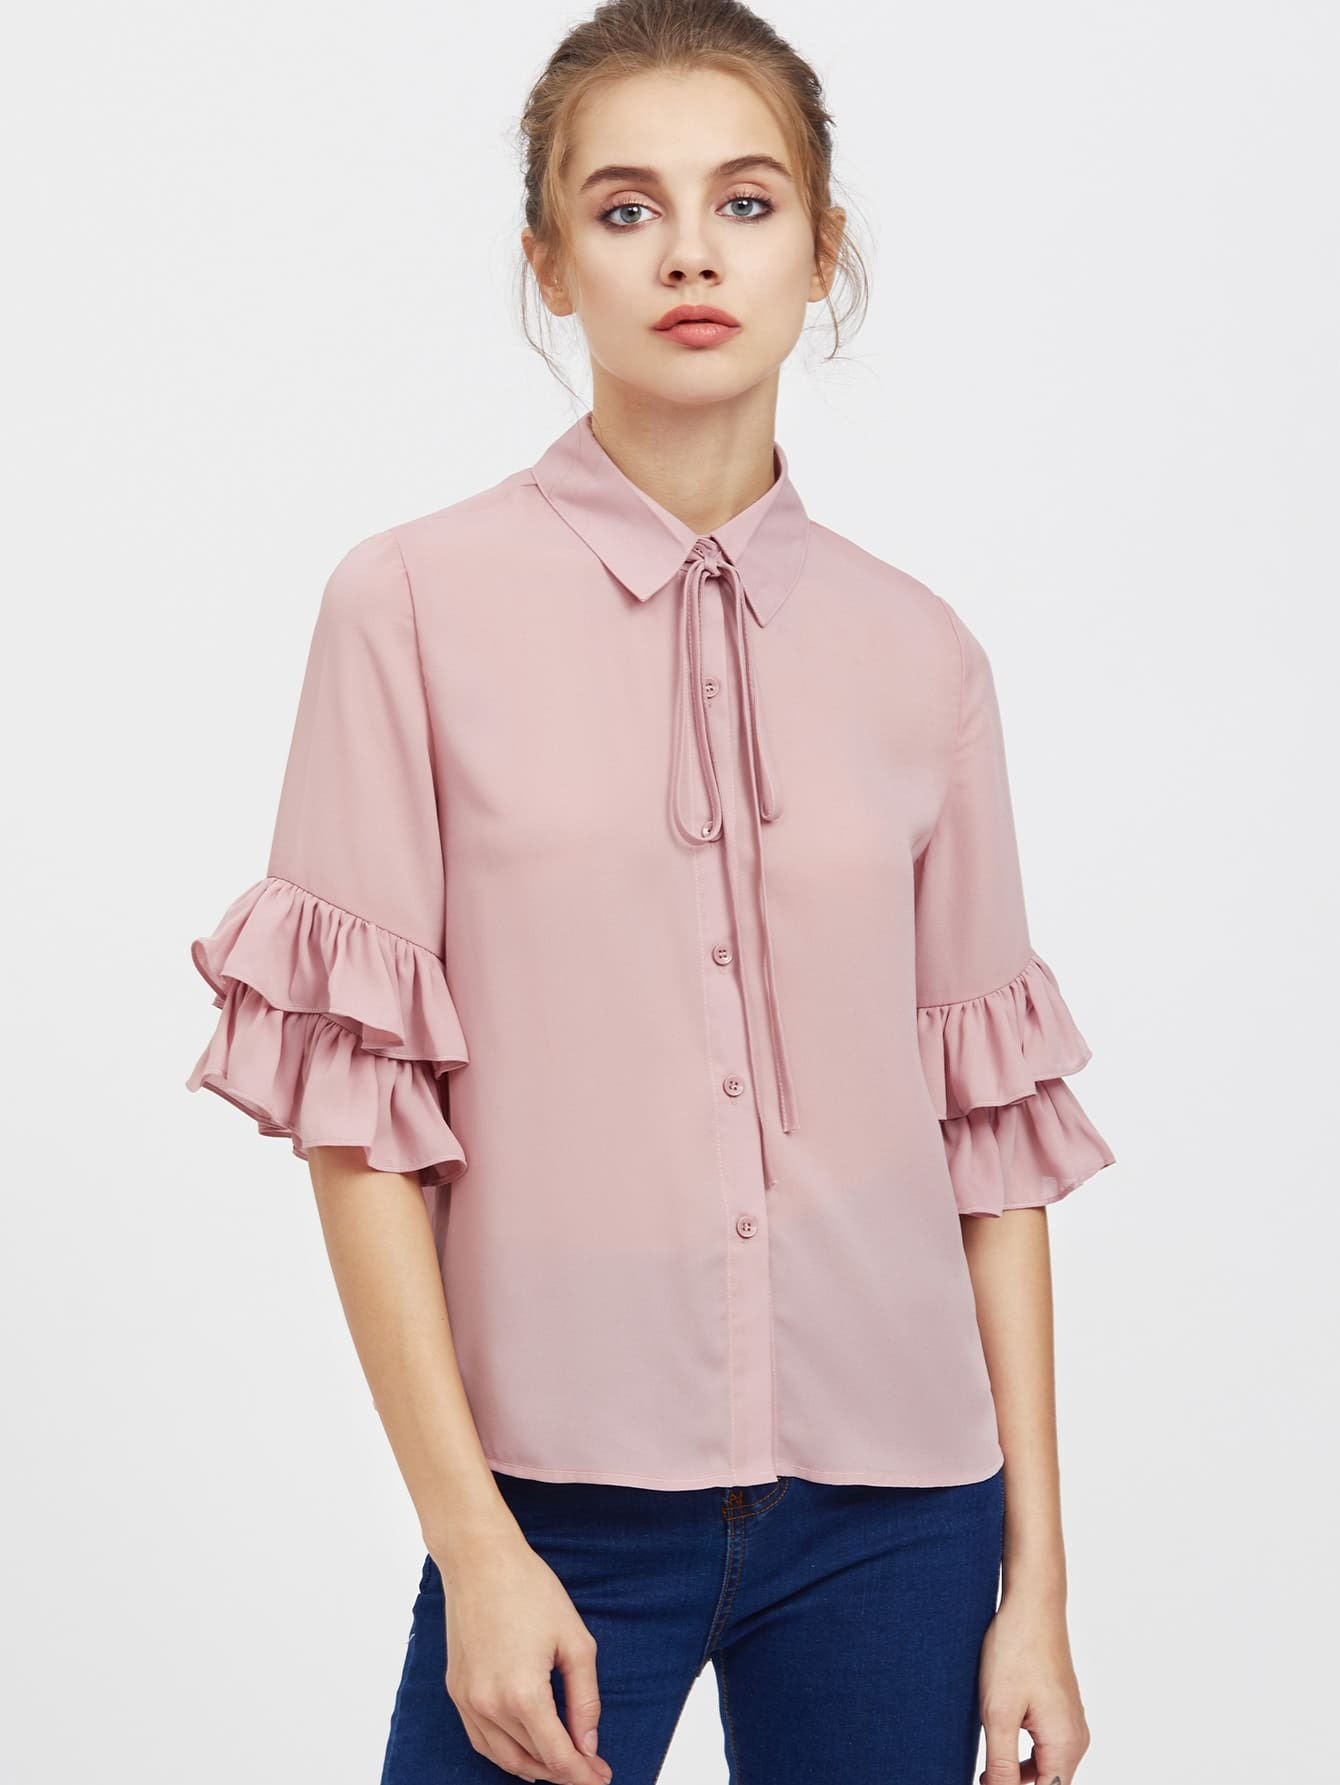 Tie Neck Layered Ruffle Sleeve Blouse blouse170508455